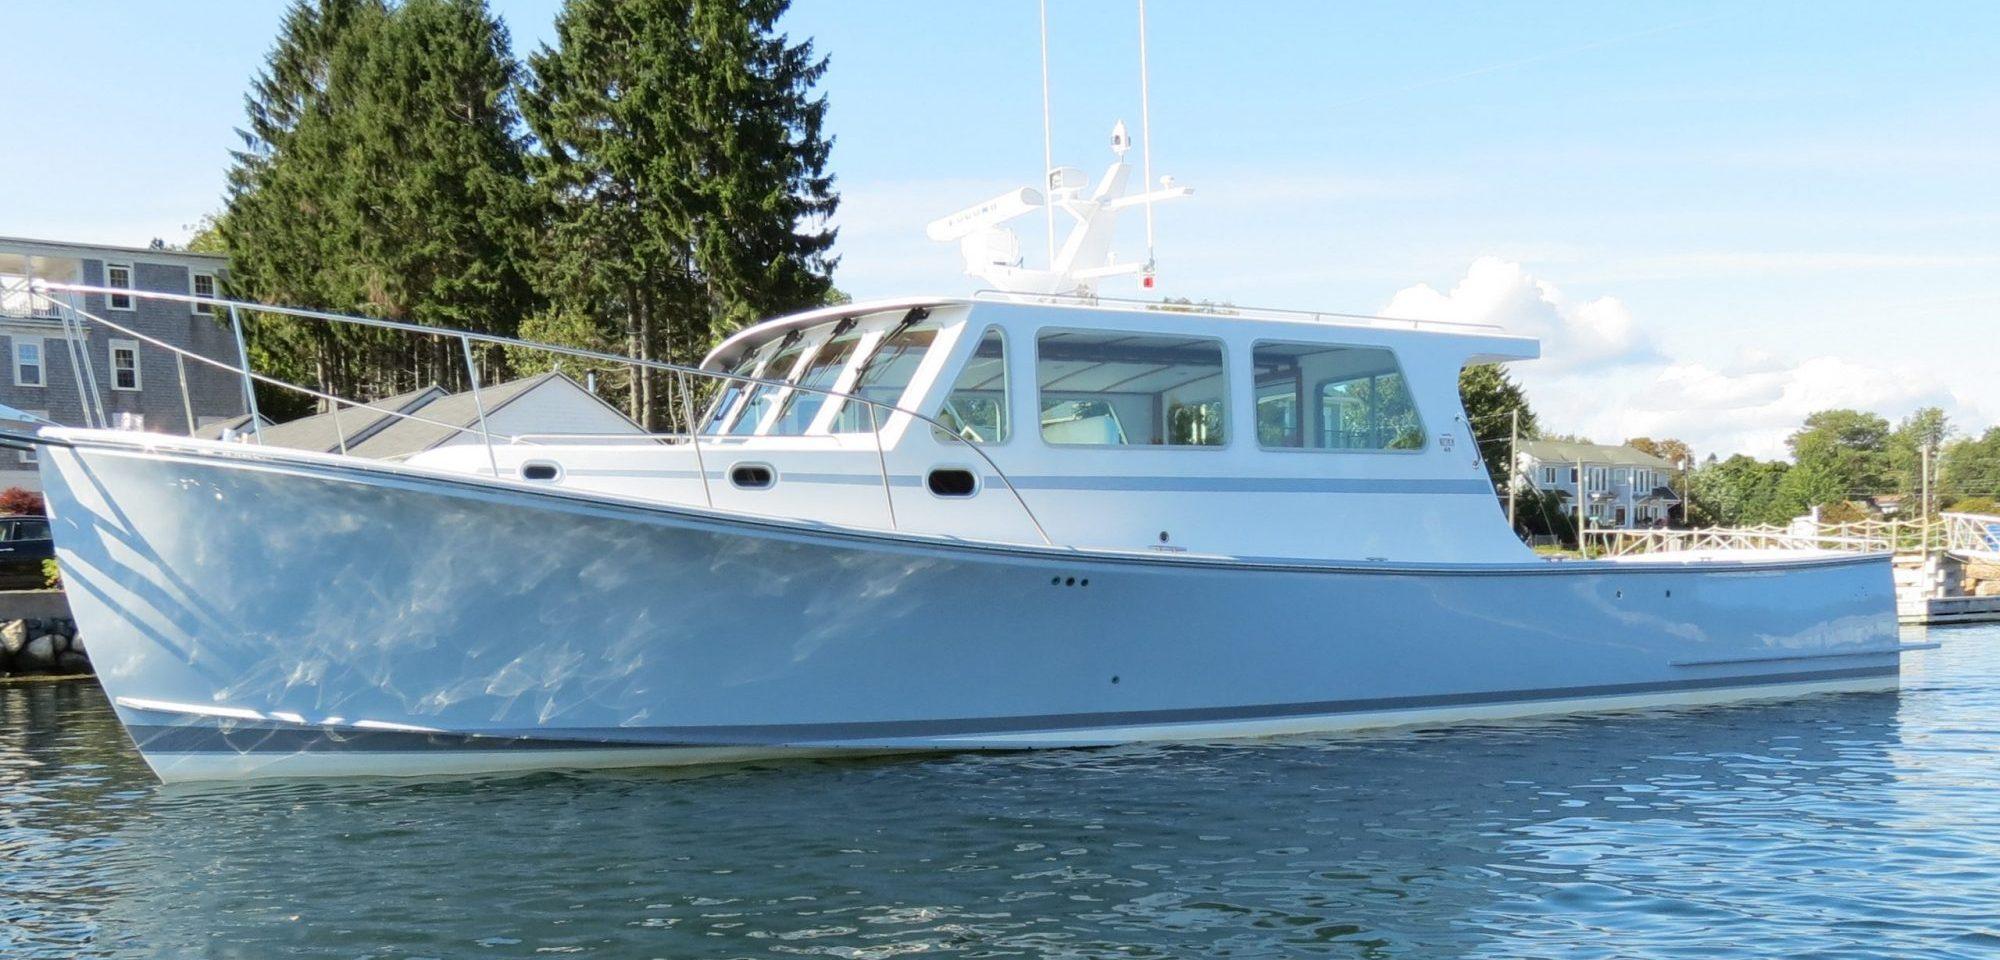 Wesmac cruiser docked